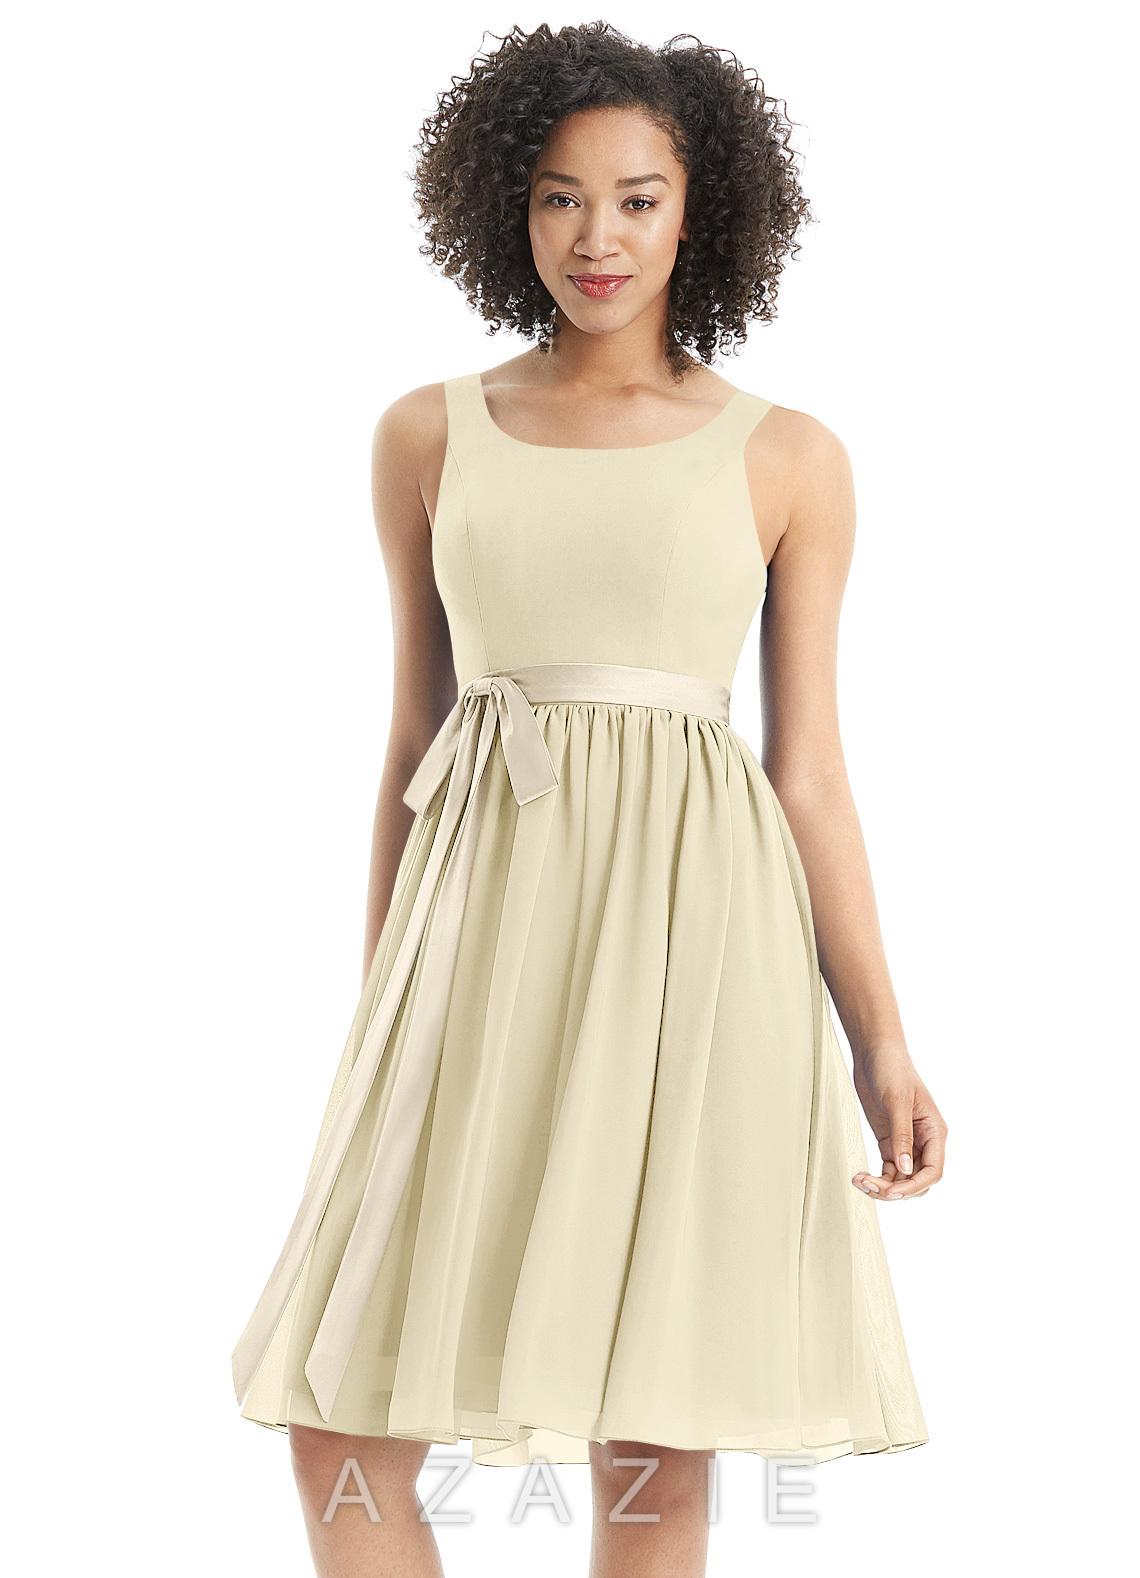 57ec31151fd Azazie Mila Bridesmaid Dresses